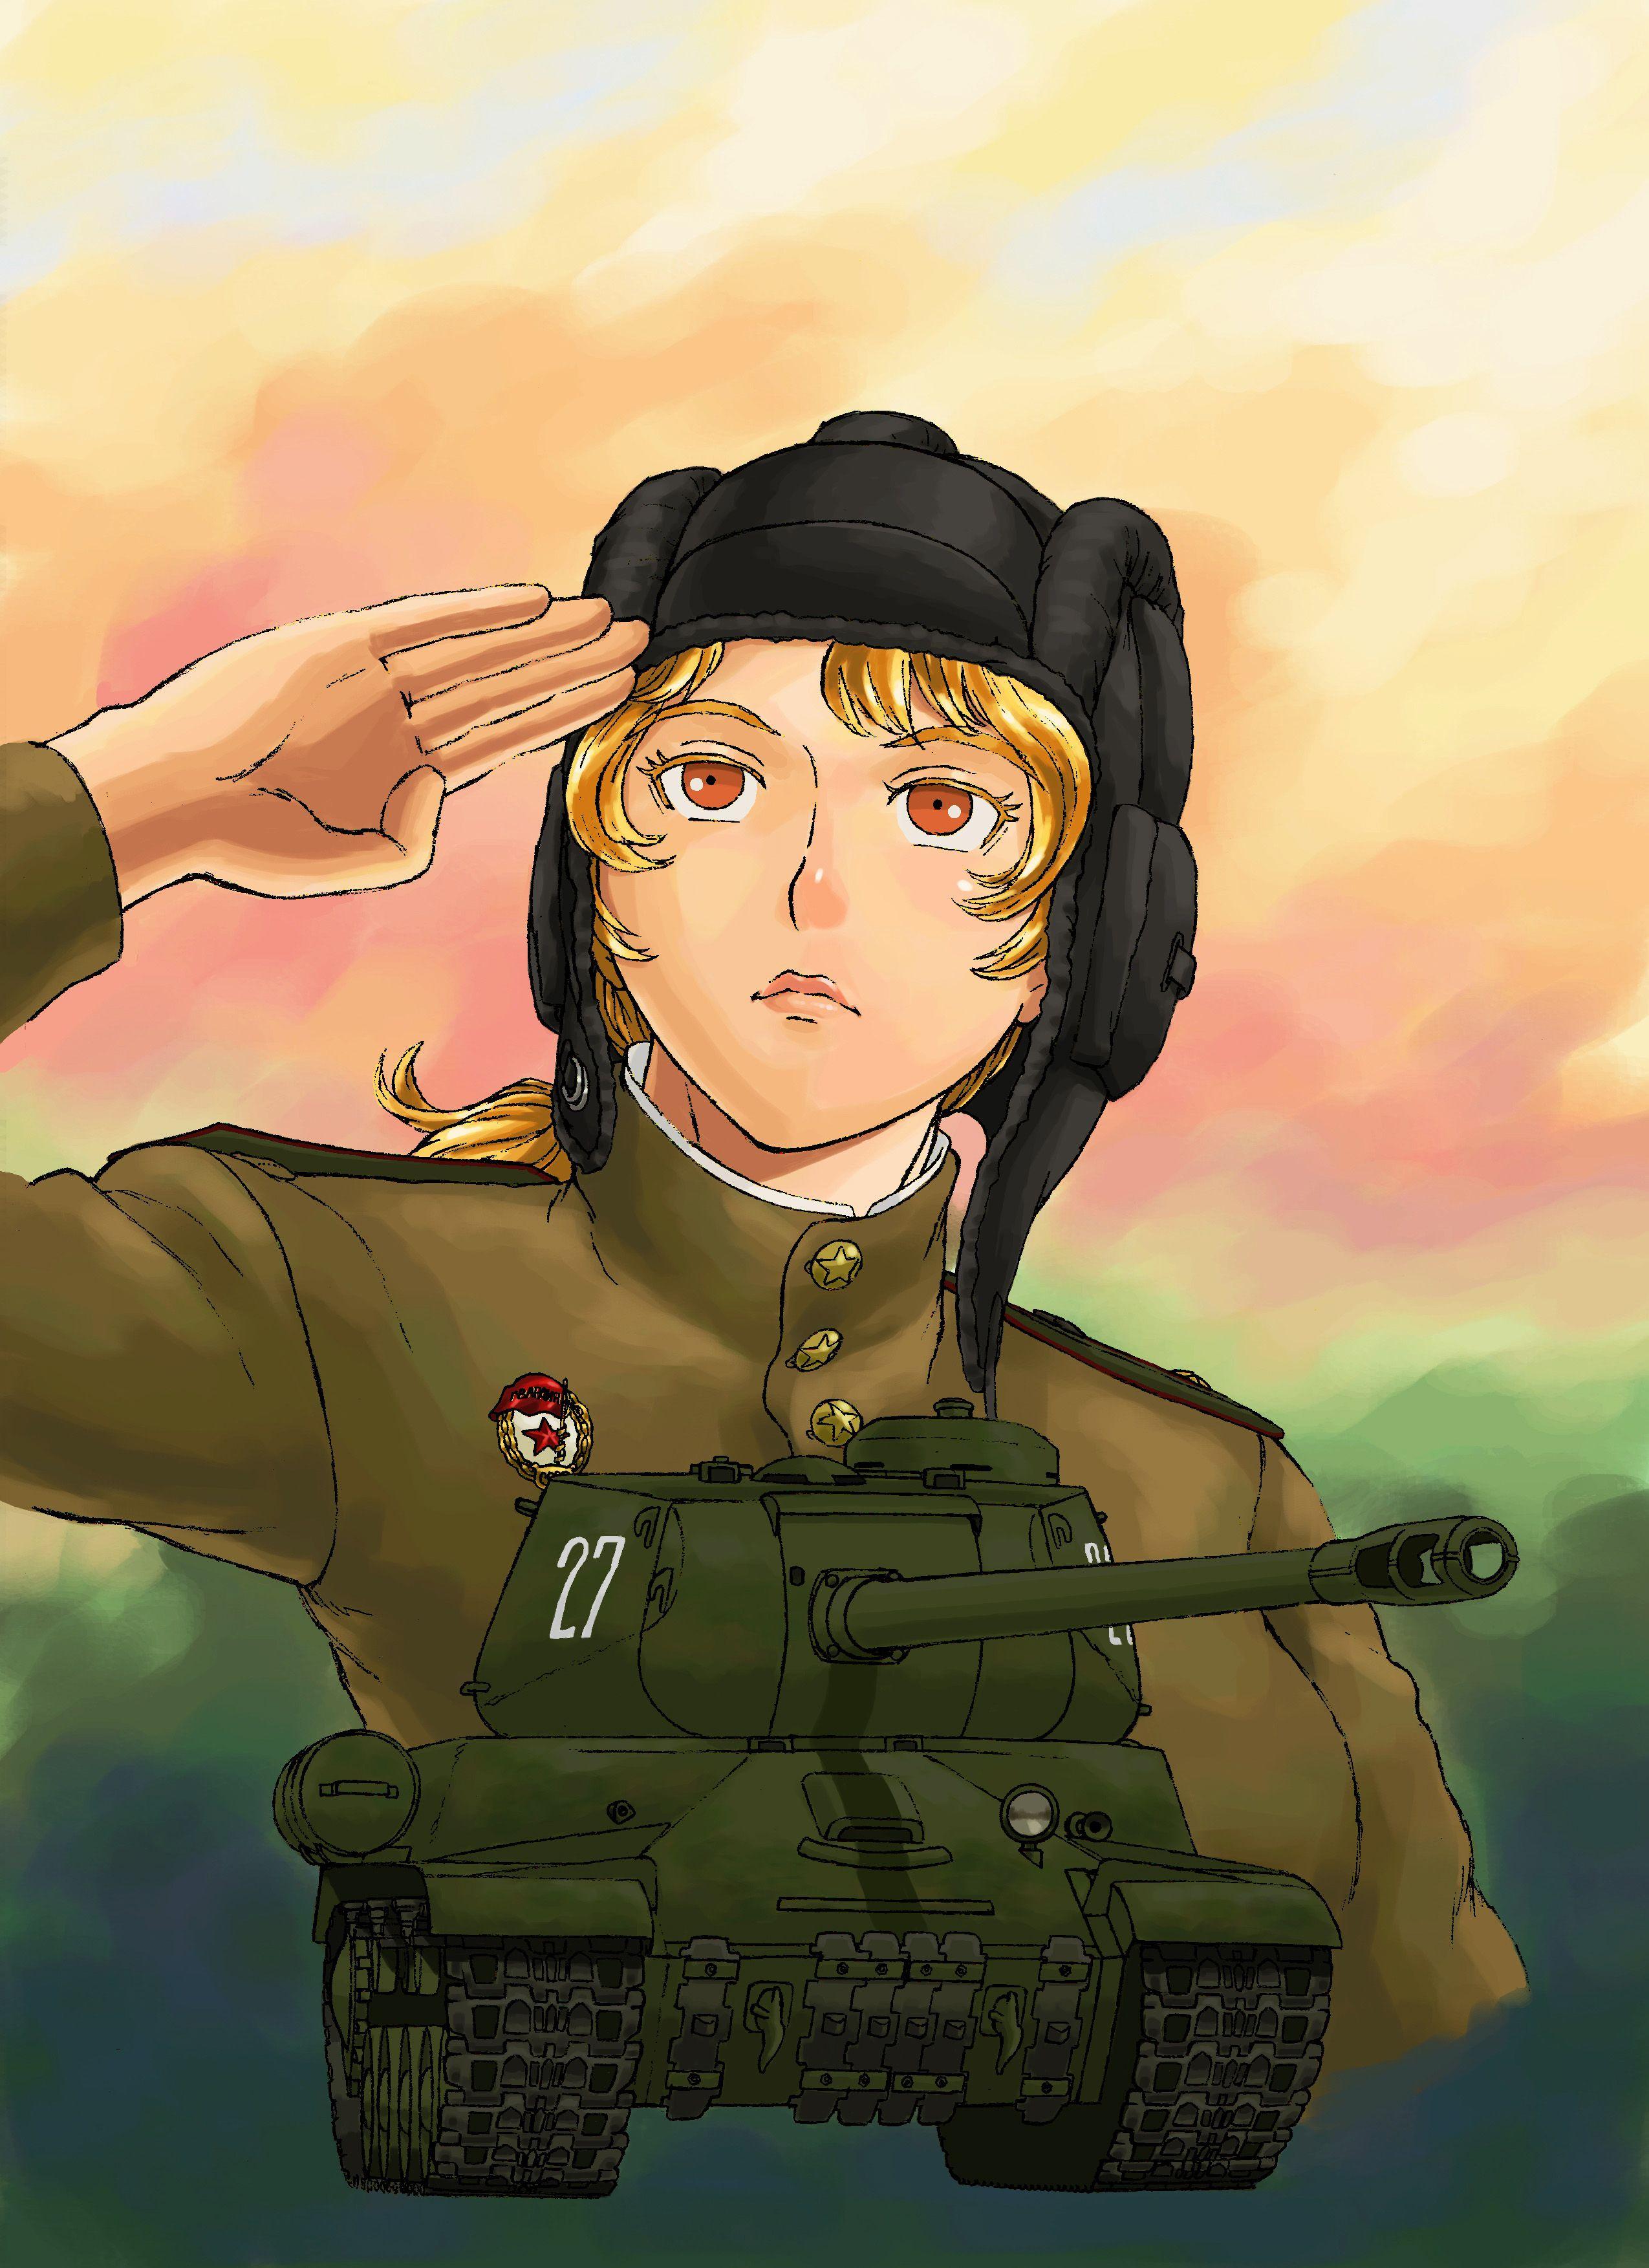 Usakotsu drew a Russian IS-2 heavy tank and woman tank ...